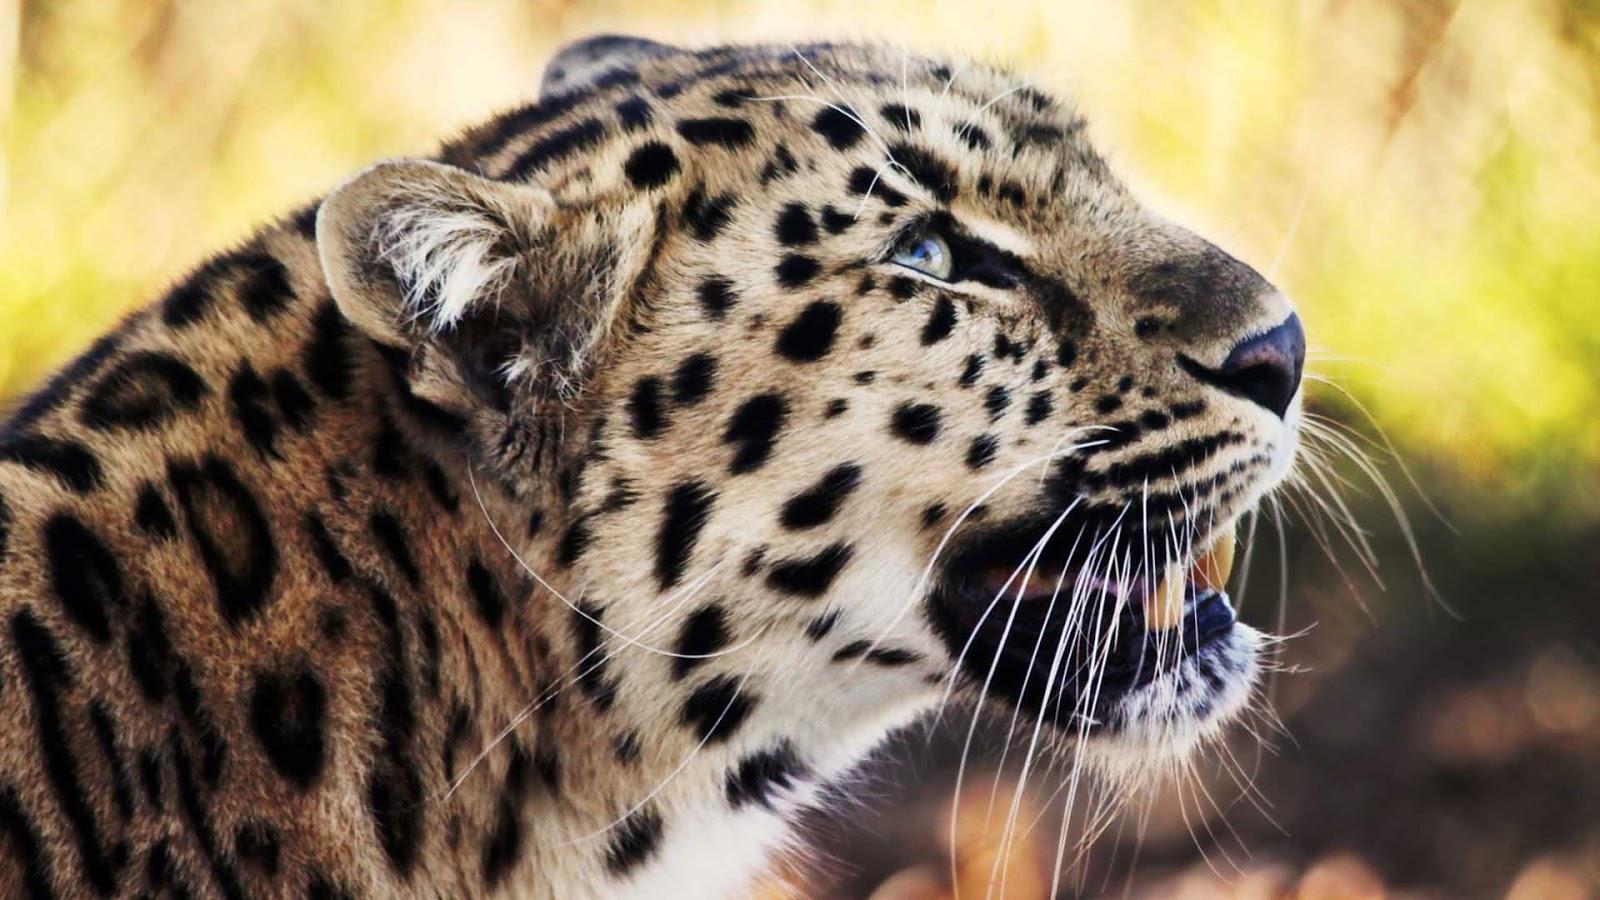 animal print wallpaper hd 1080p - photo #10